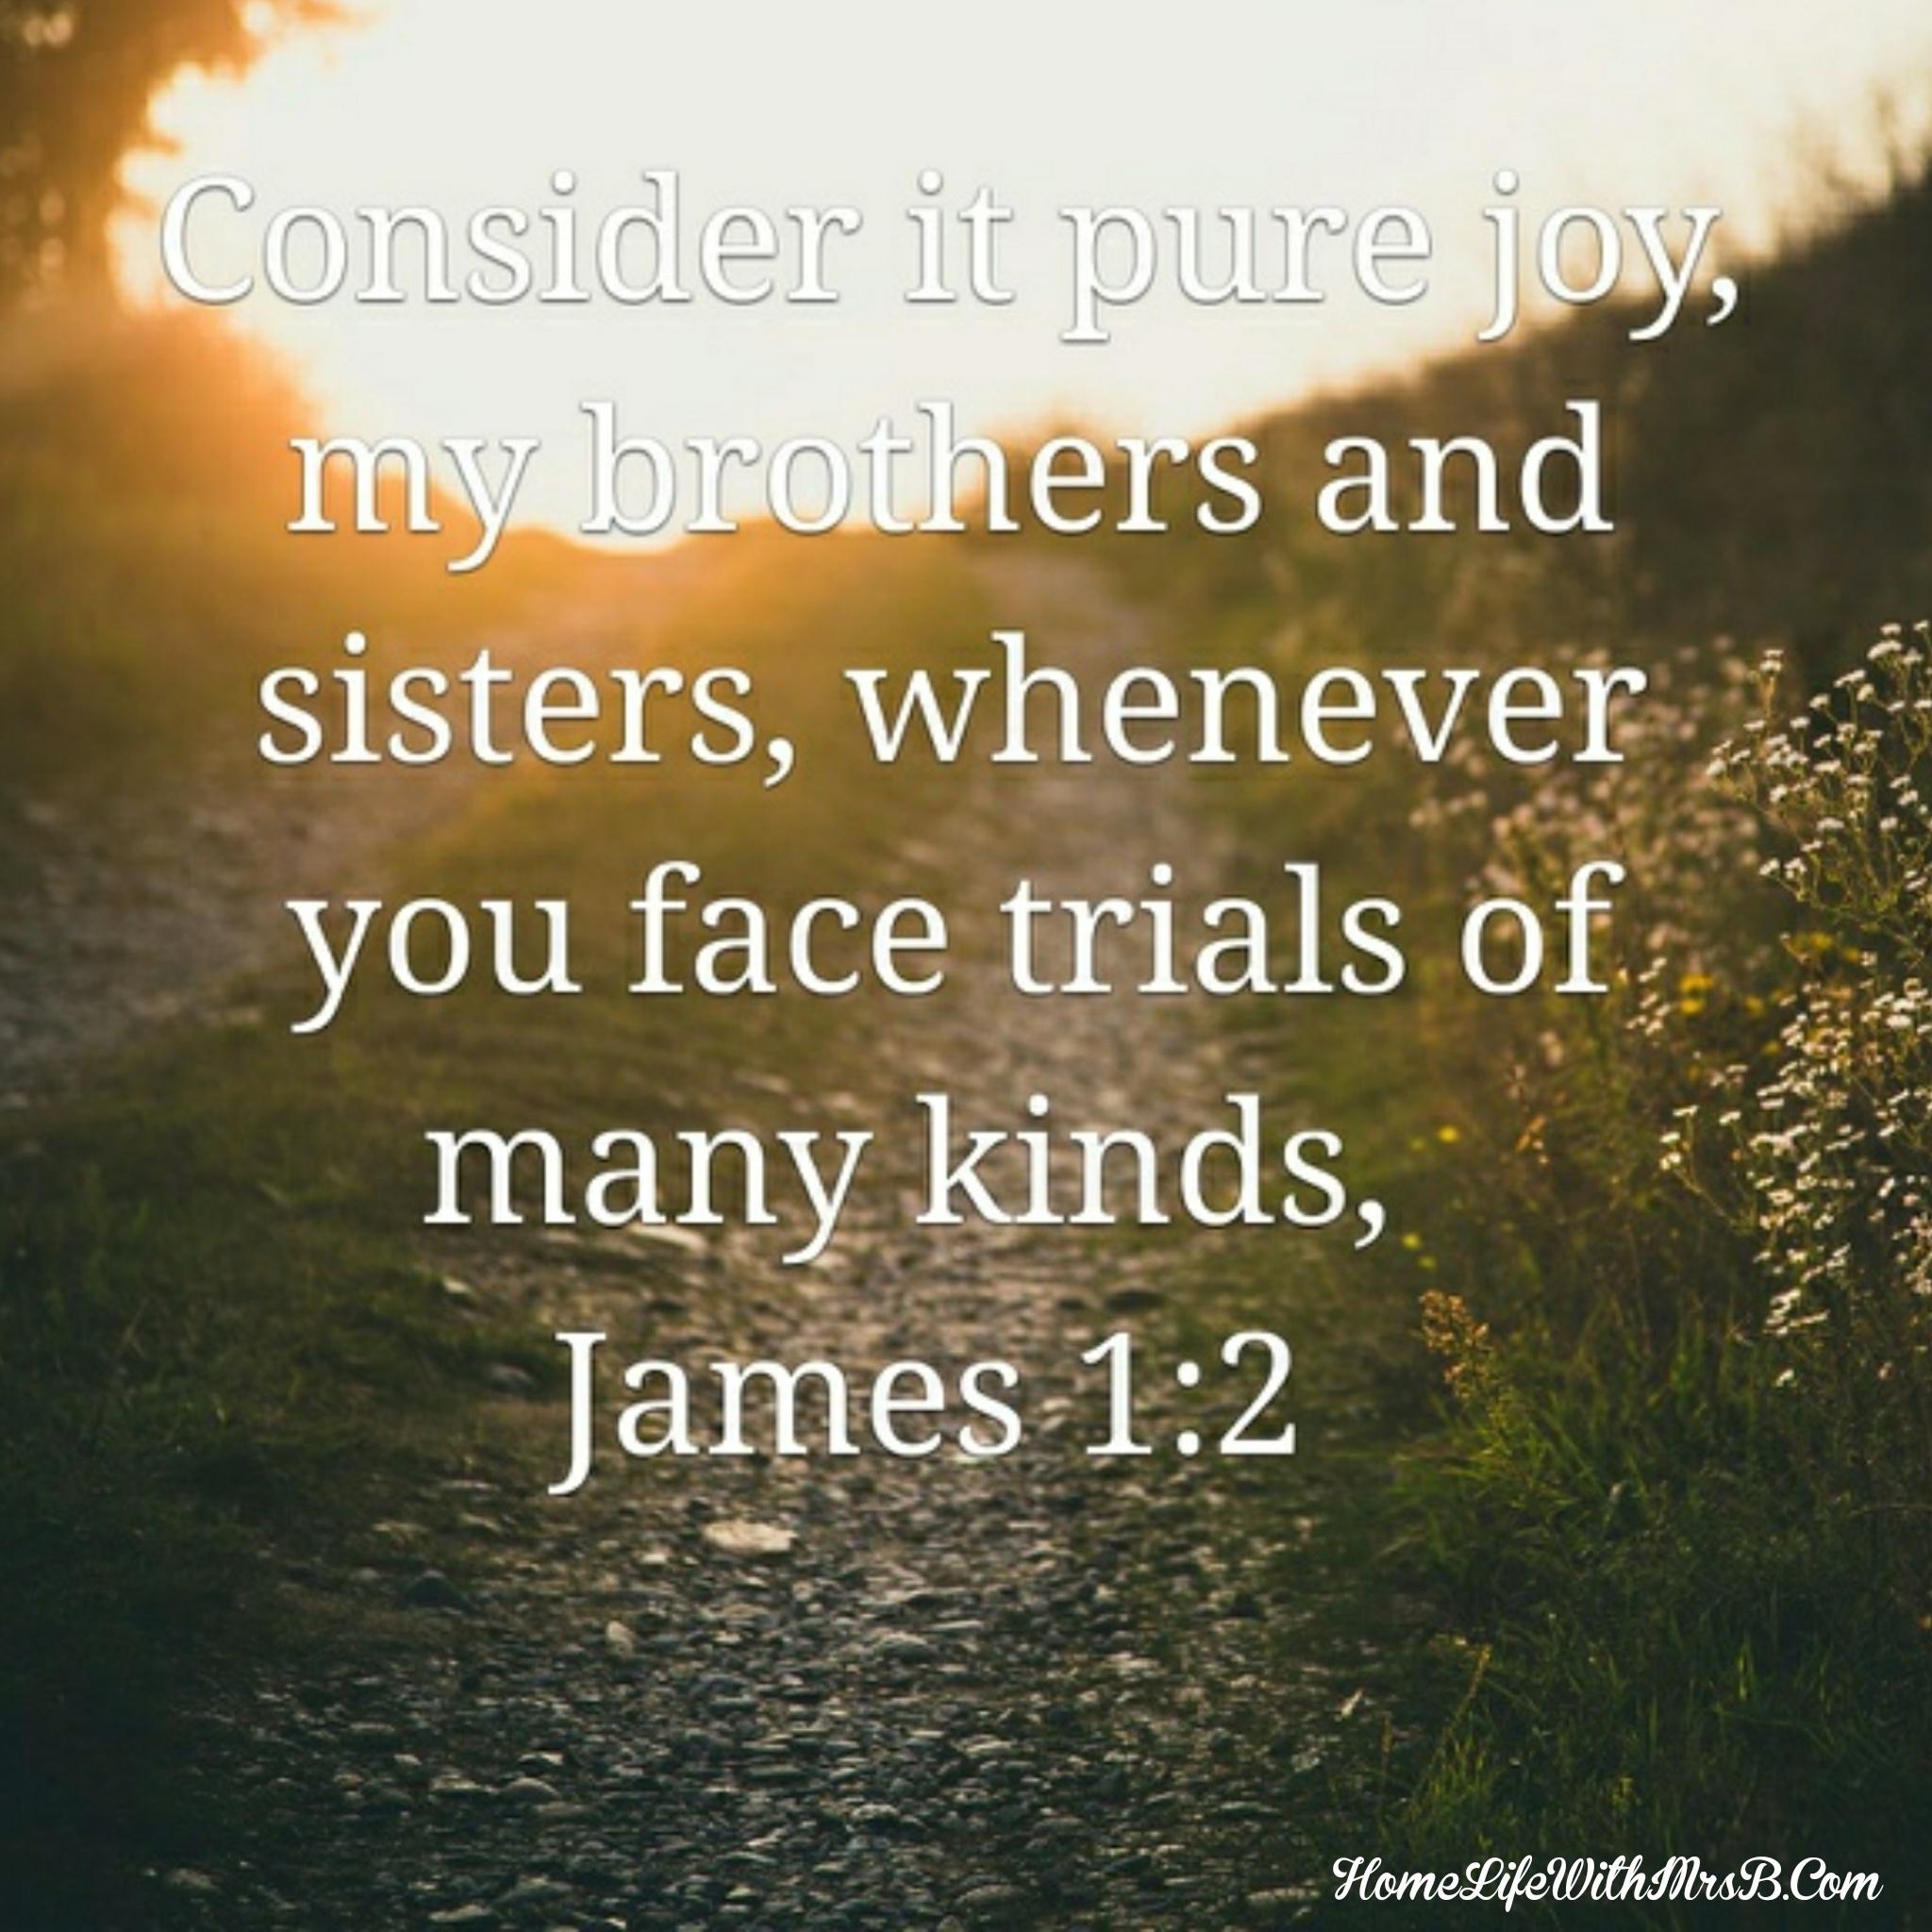 James 12